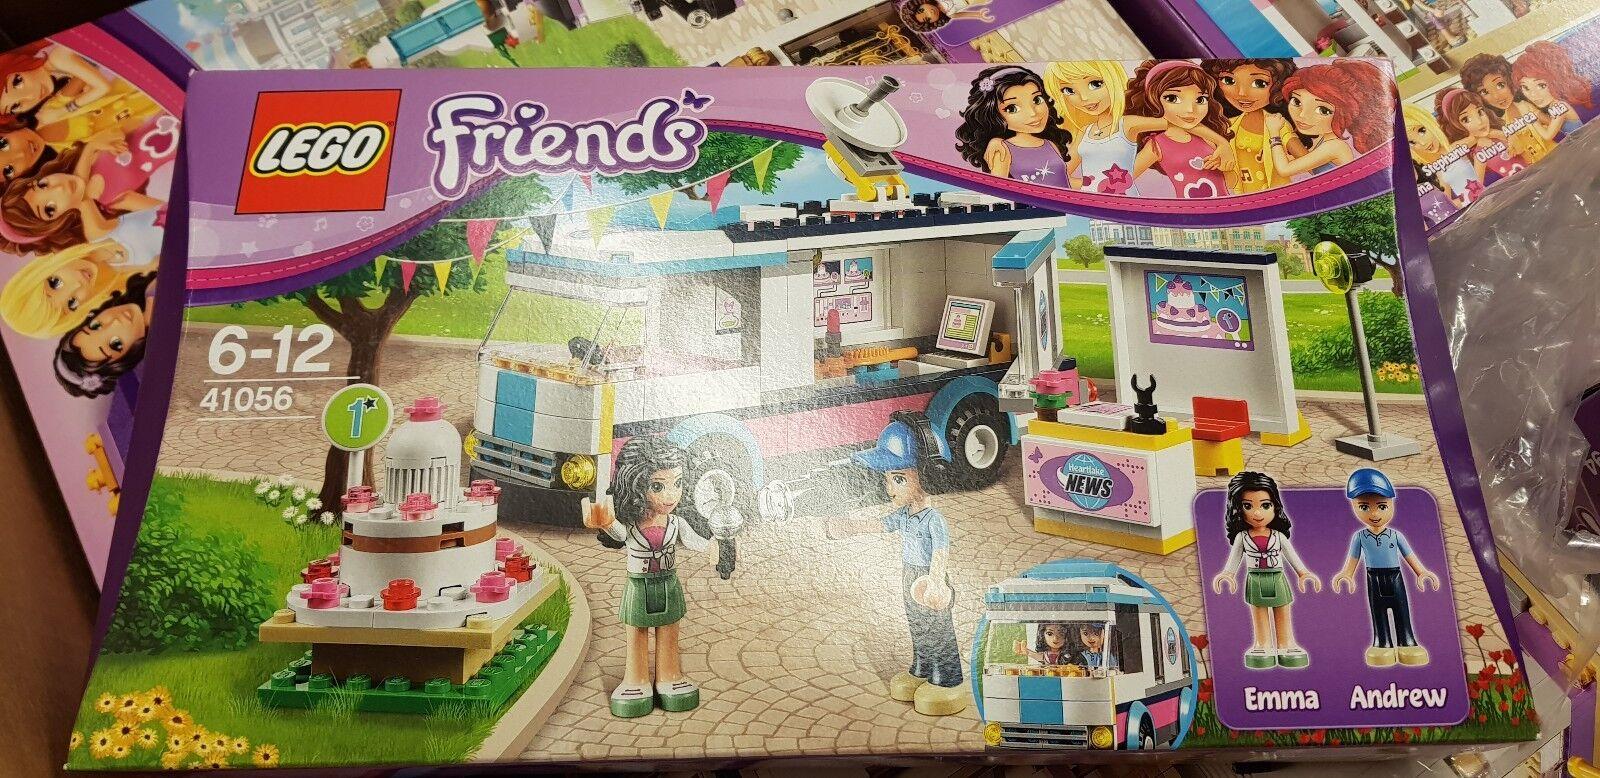 LEGO Friends Heartlake News Van (41056)